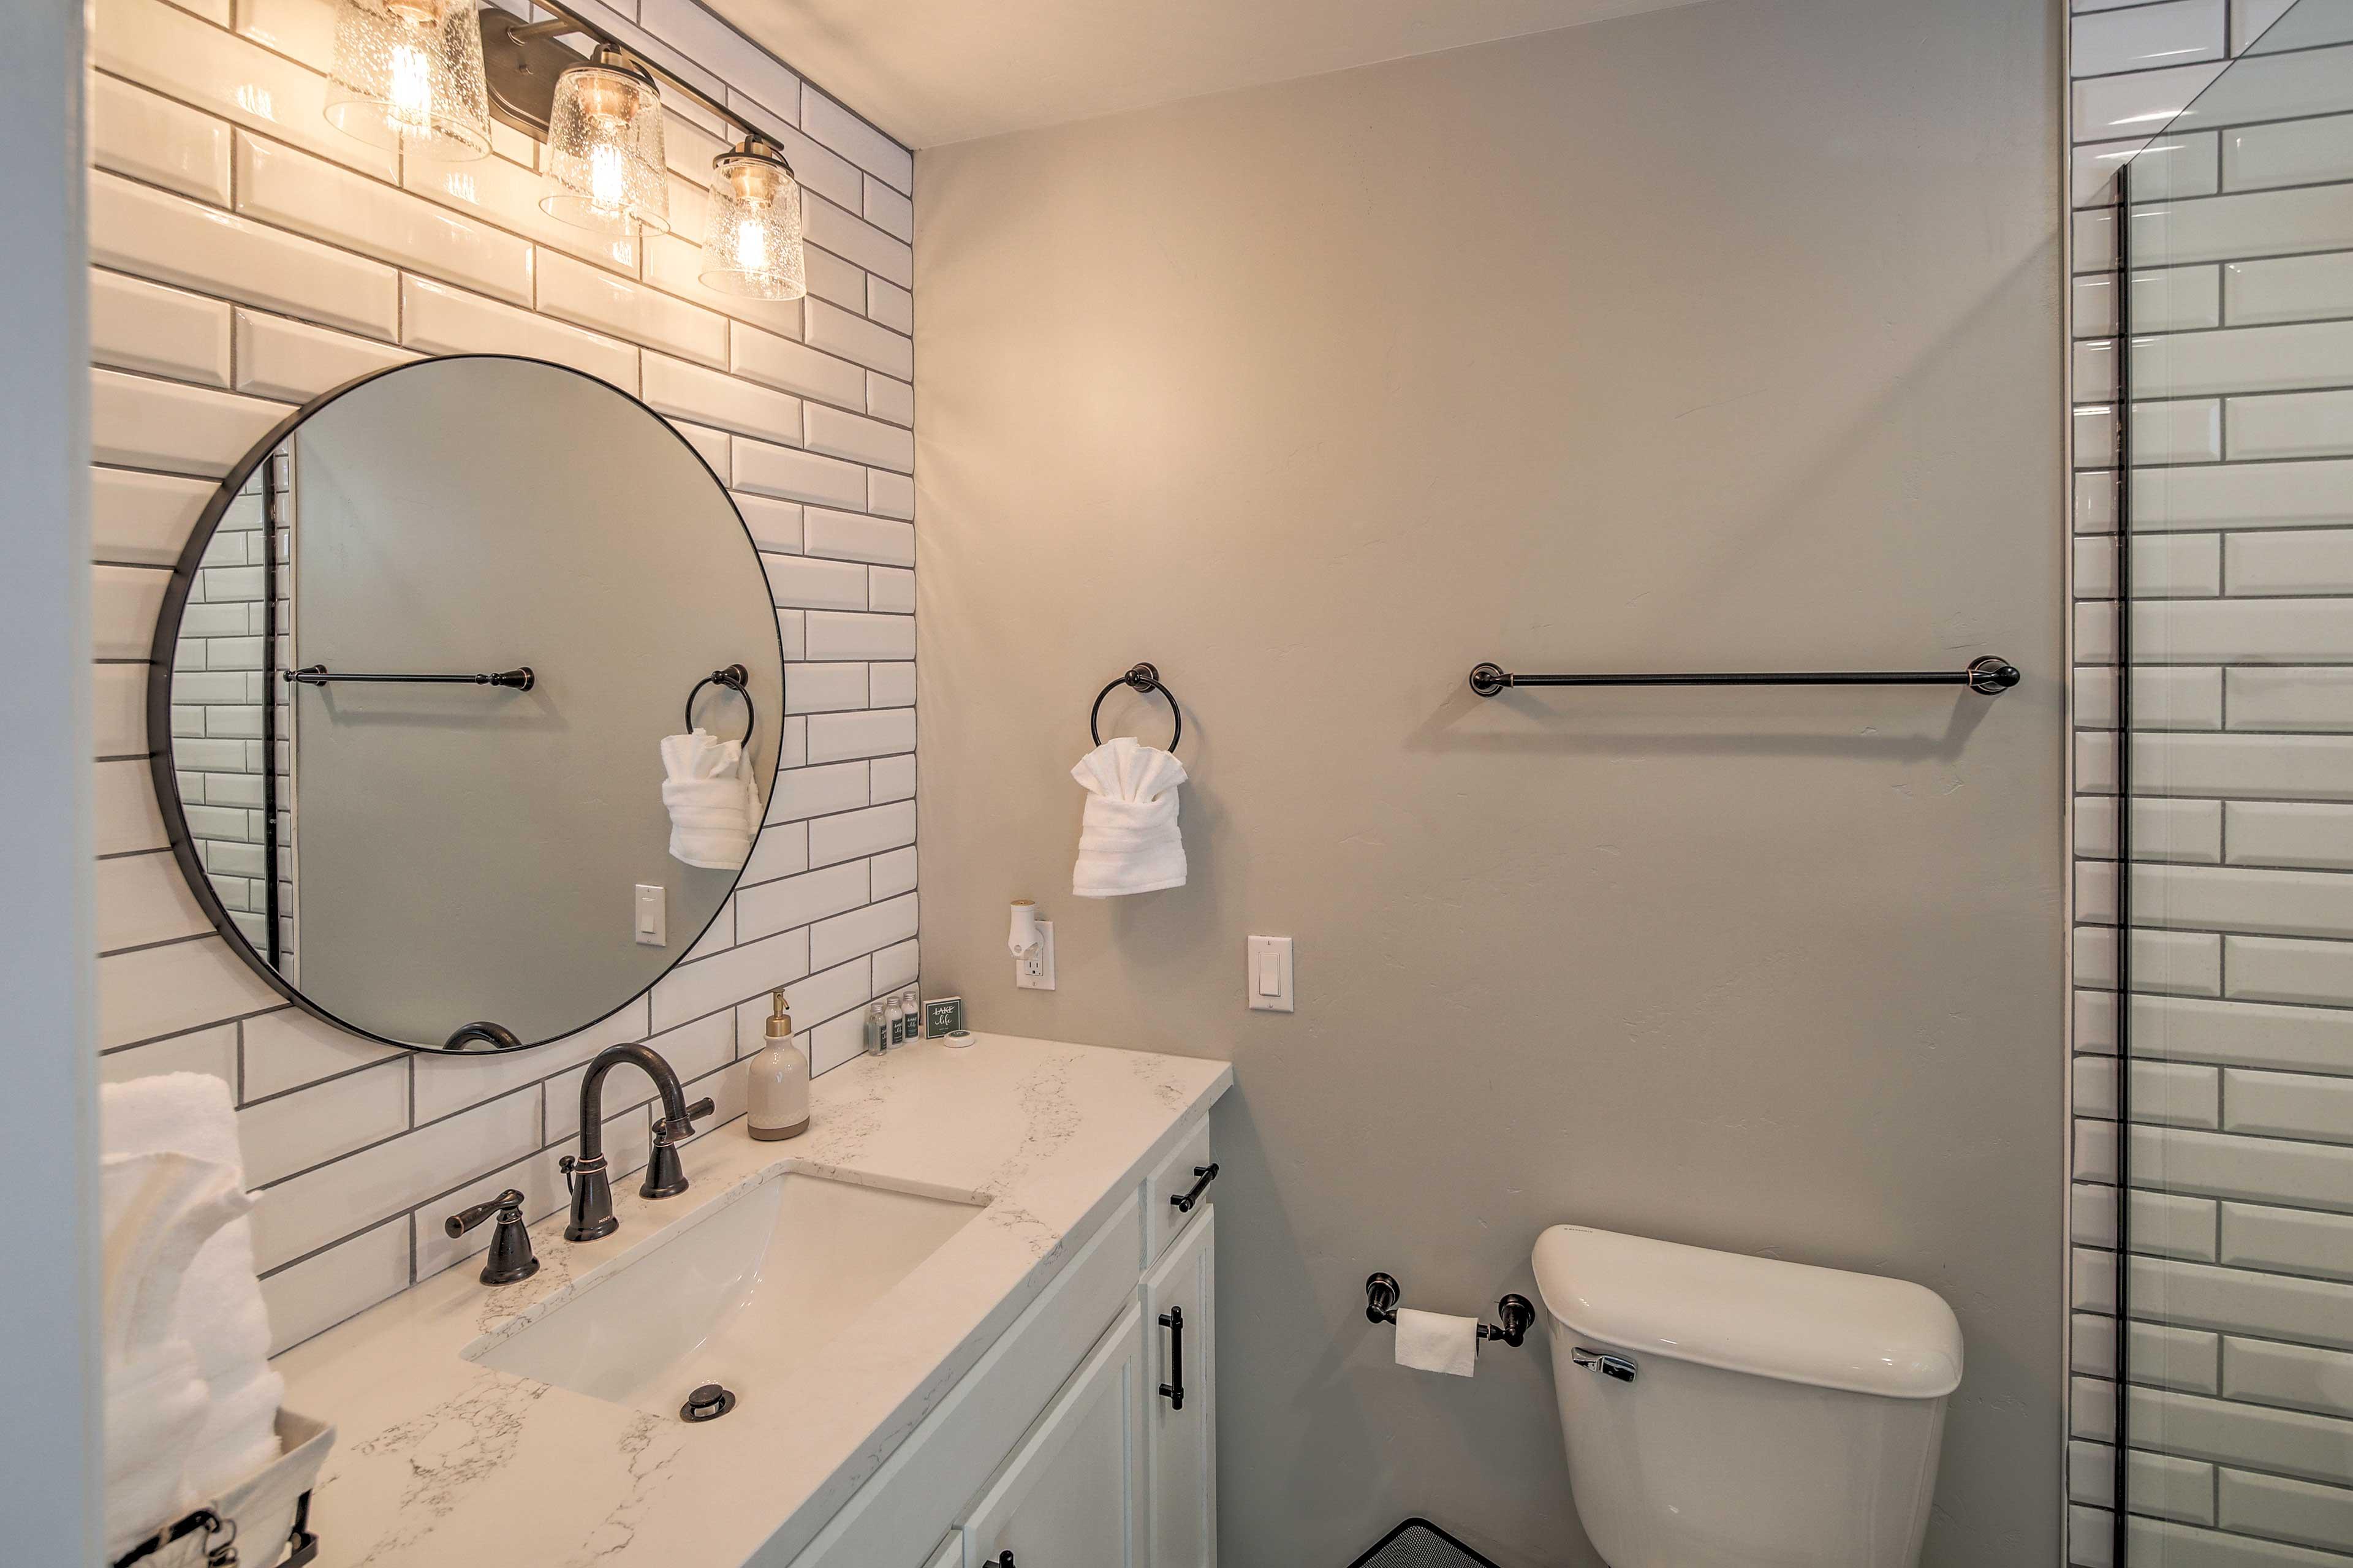 Enjoy complimentary toiletries.